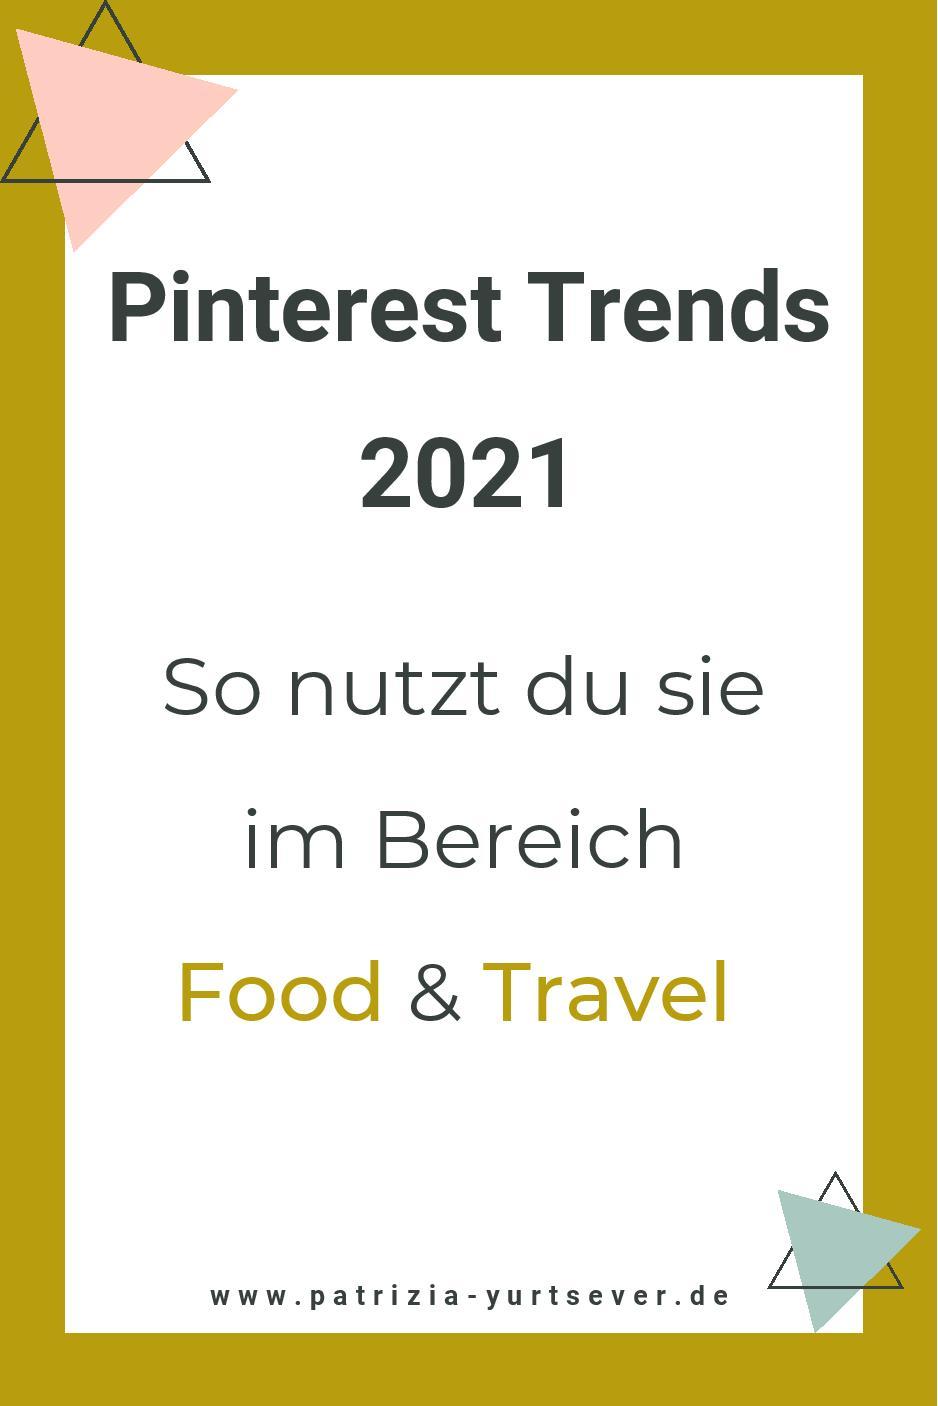 Pinterest Trends 2021